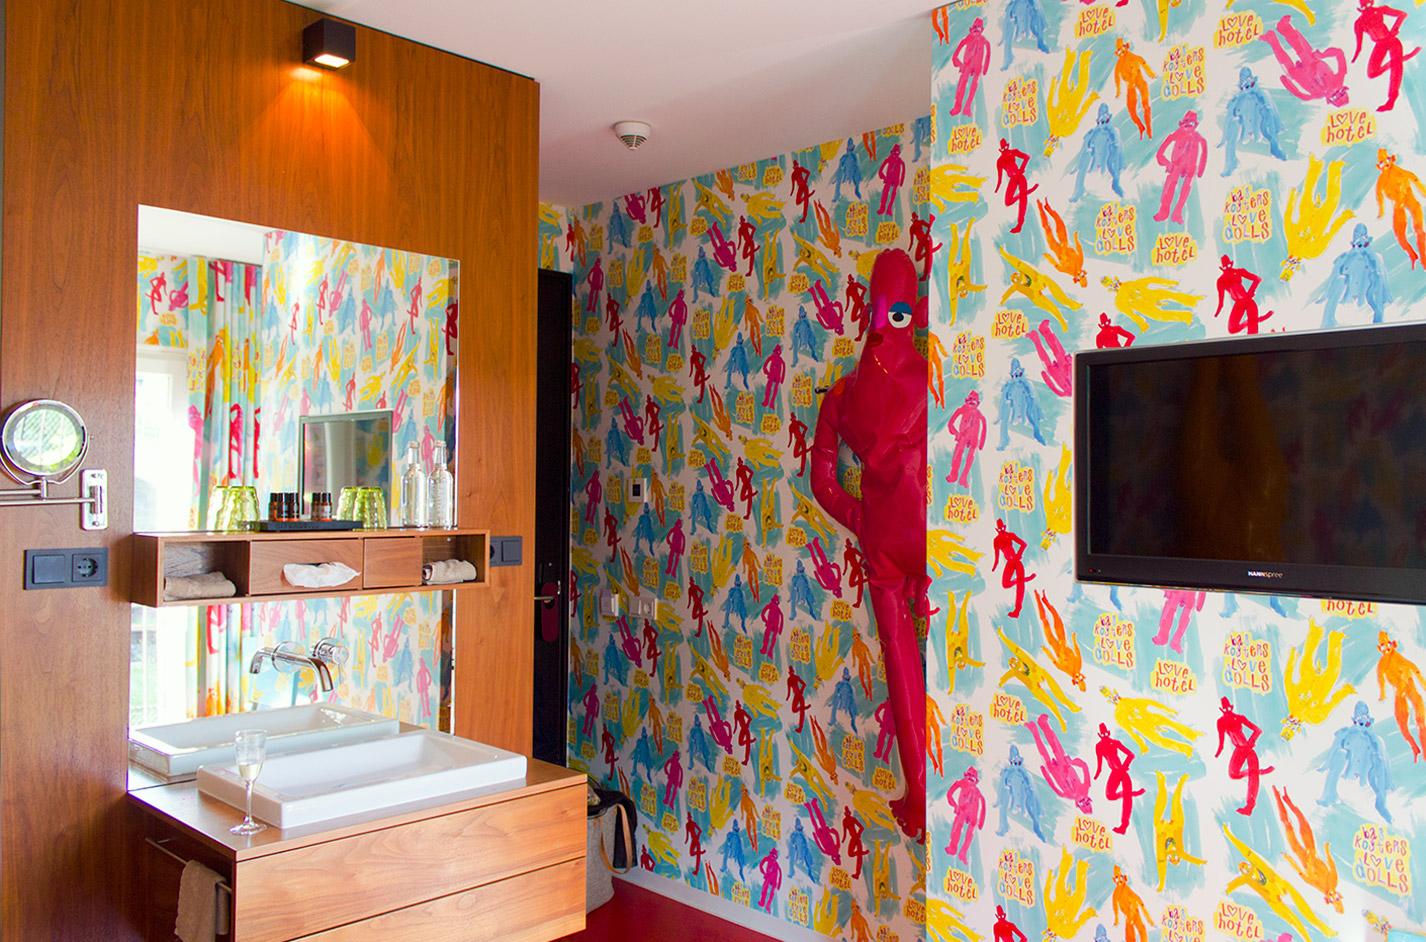 arnhem-hotspot-hotel-modez-03